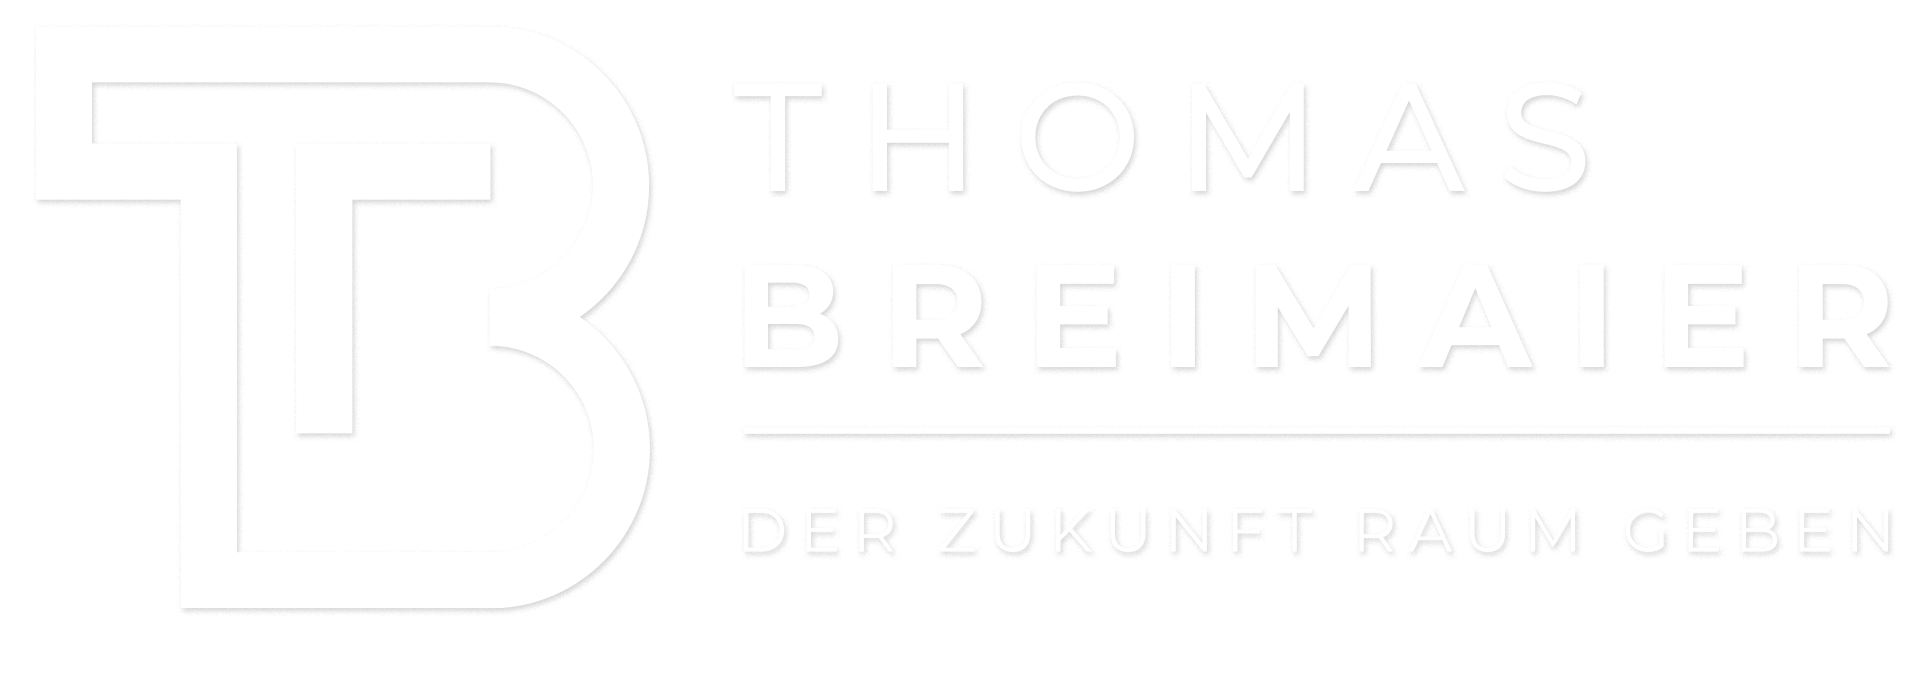 Thomas Breimaier